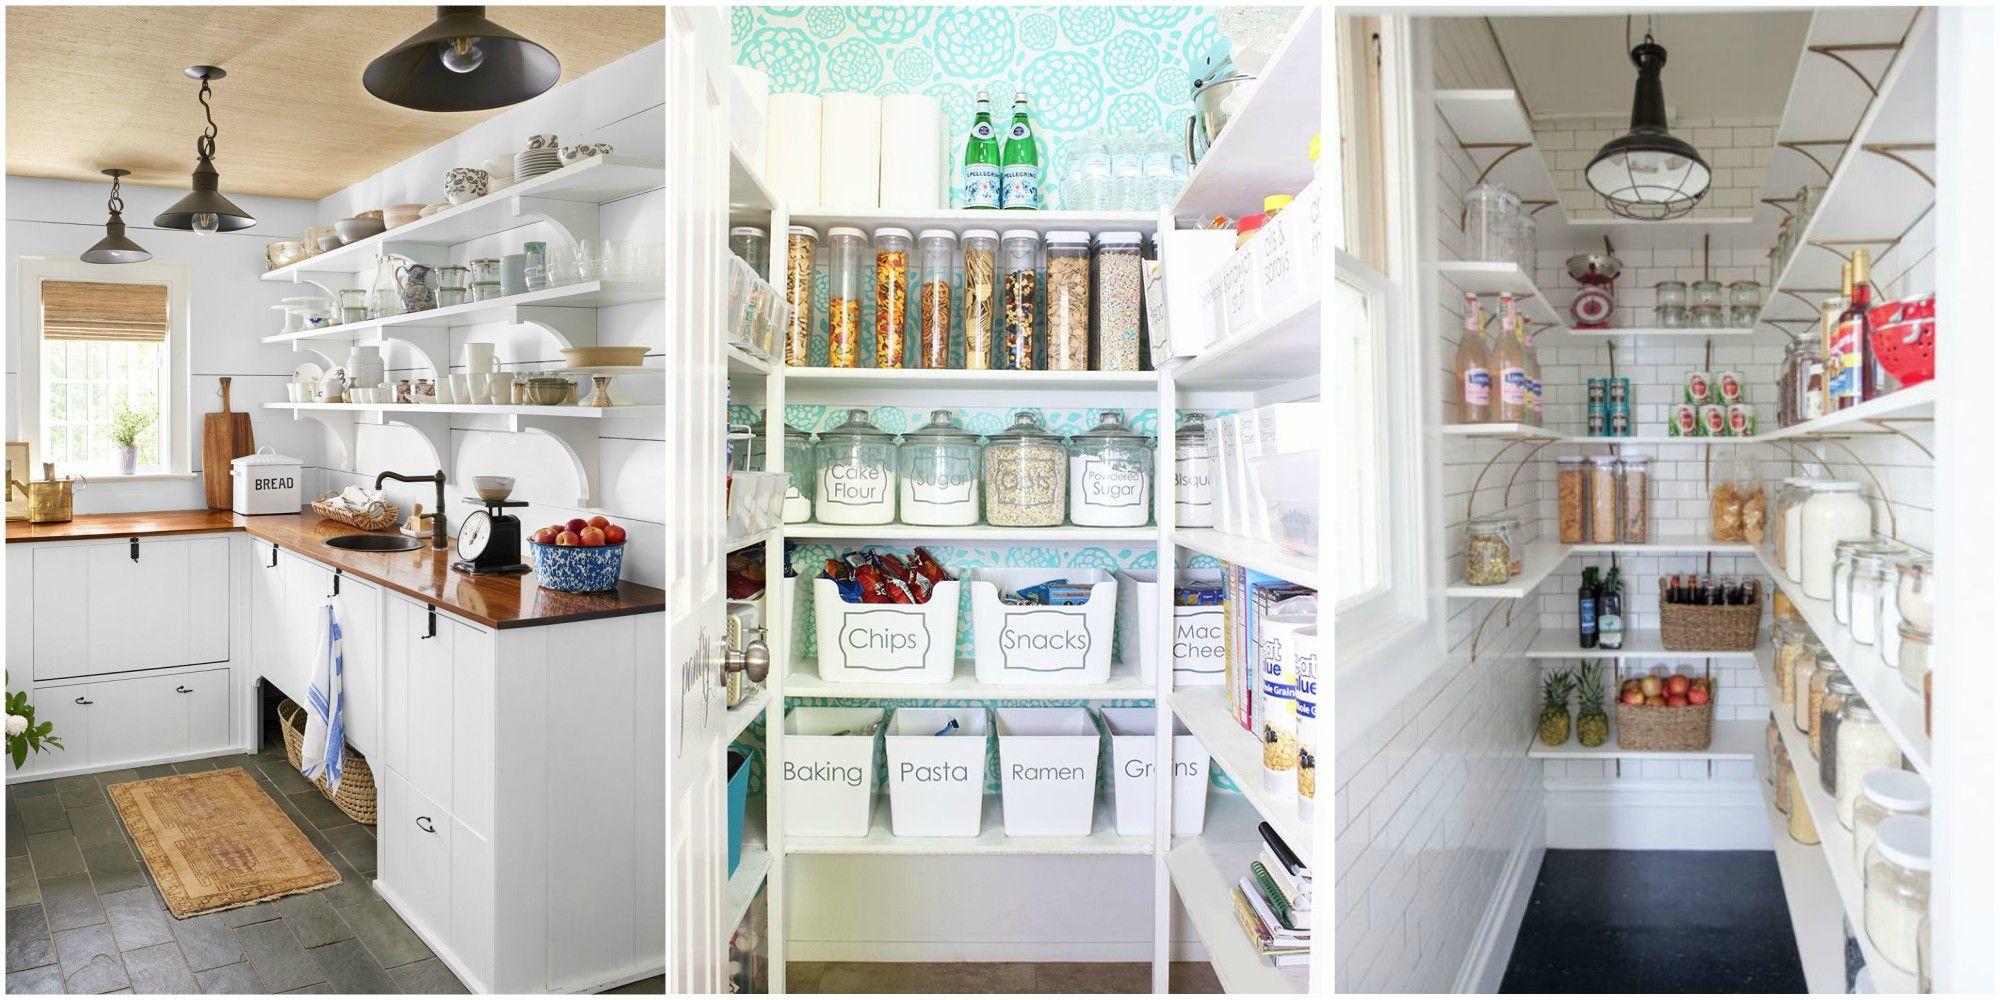 16 Kitchen Pantry Organization Ideas How To Organize A Pantry